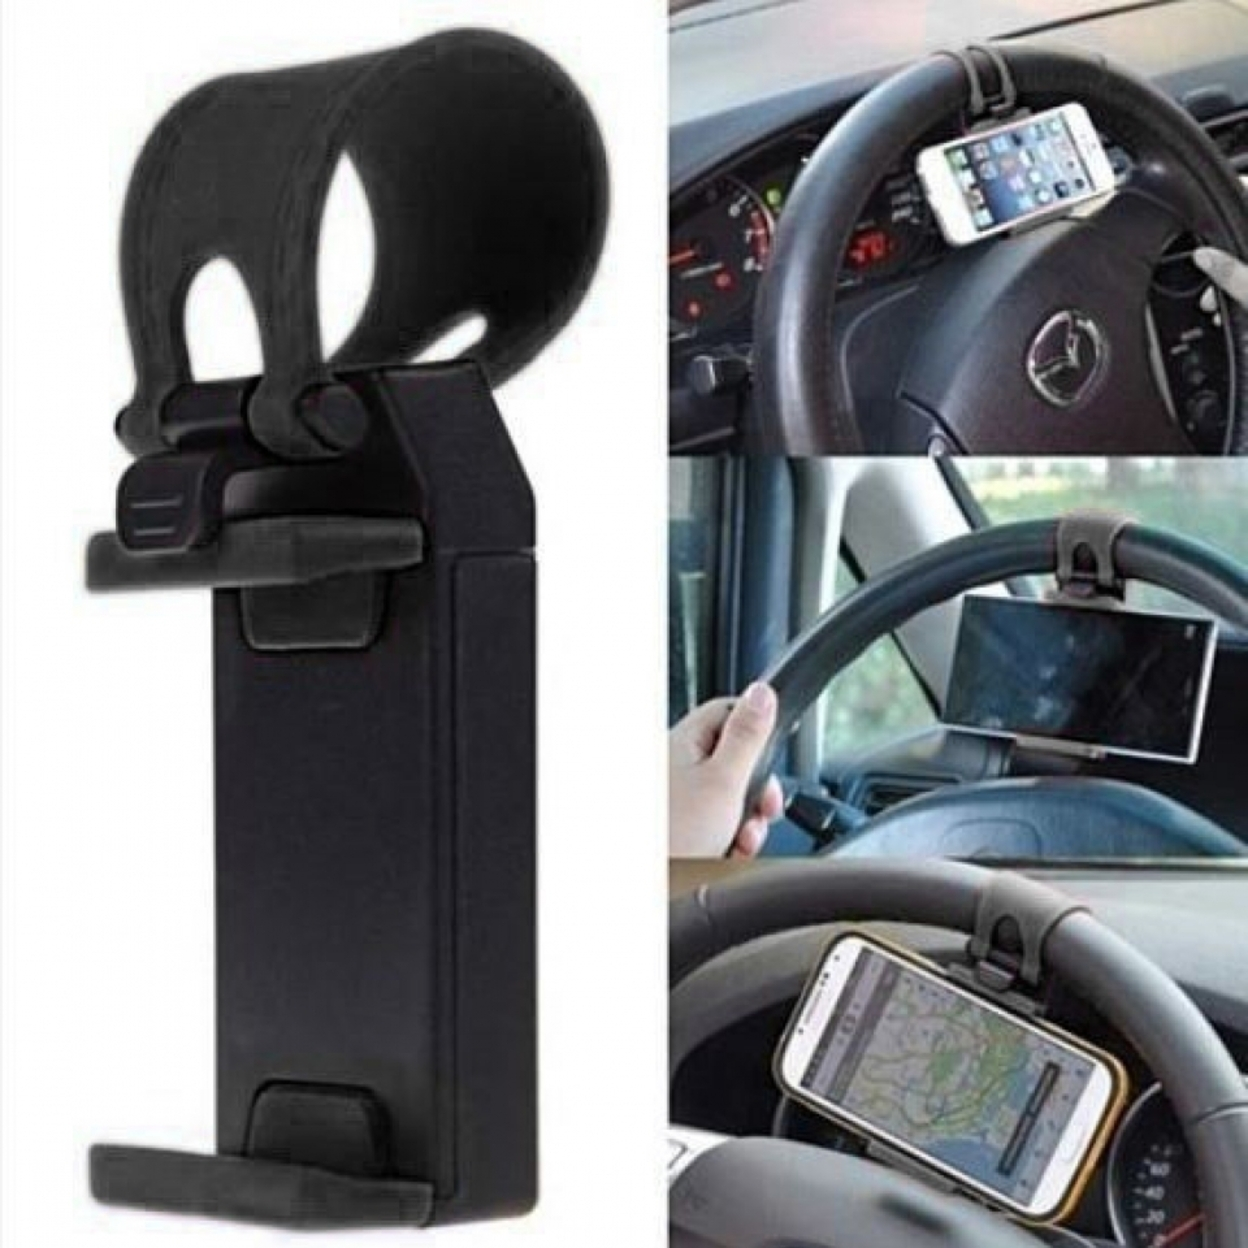 Revised Pricing Universal Car Steering Wheel Phone Mount Holder 4 Colors Black